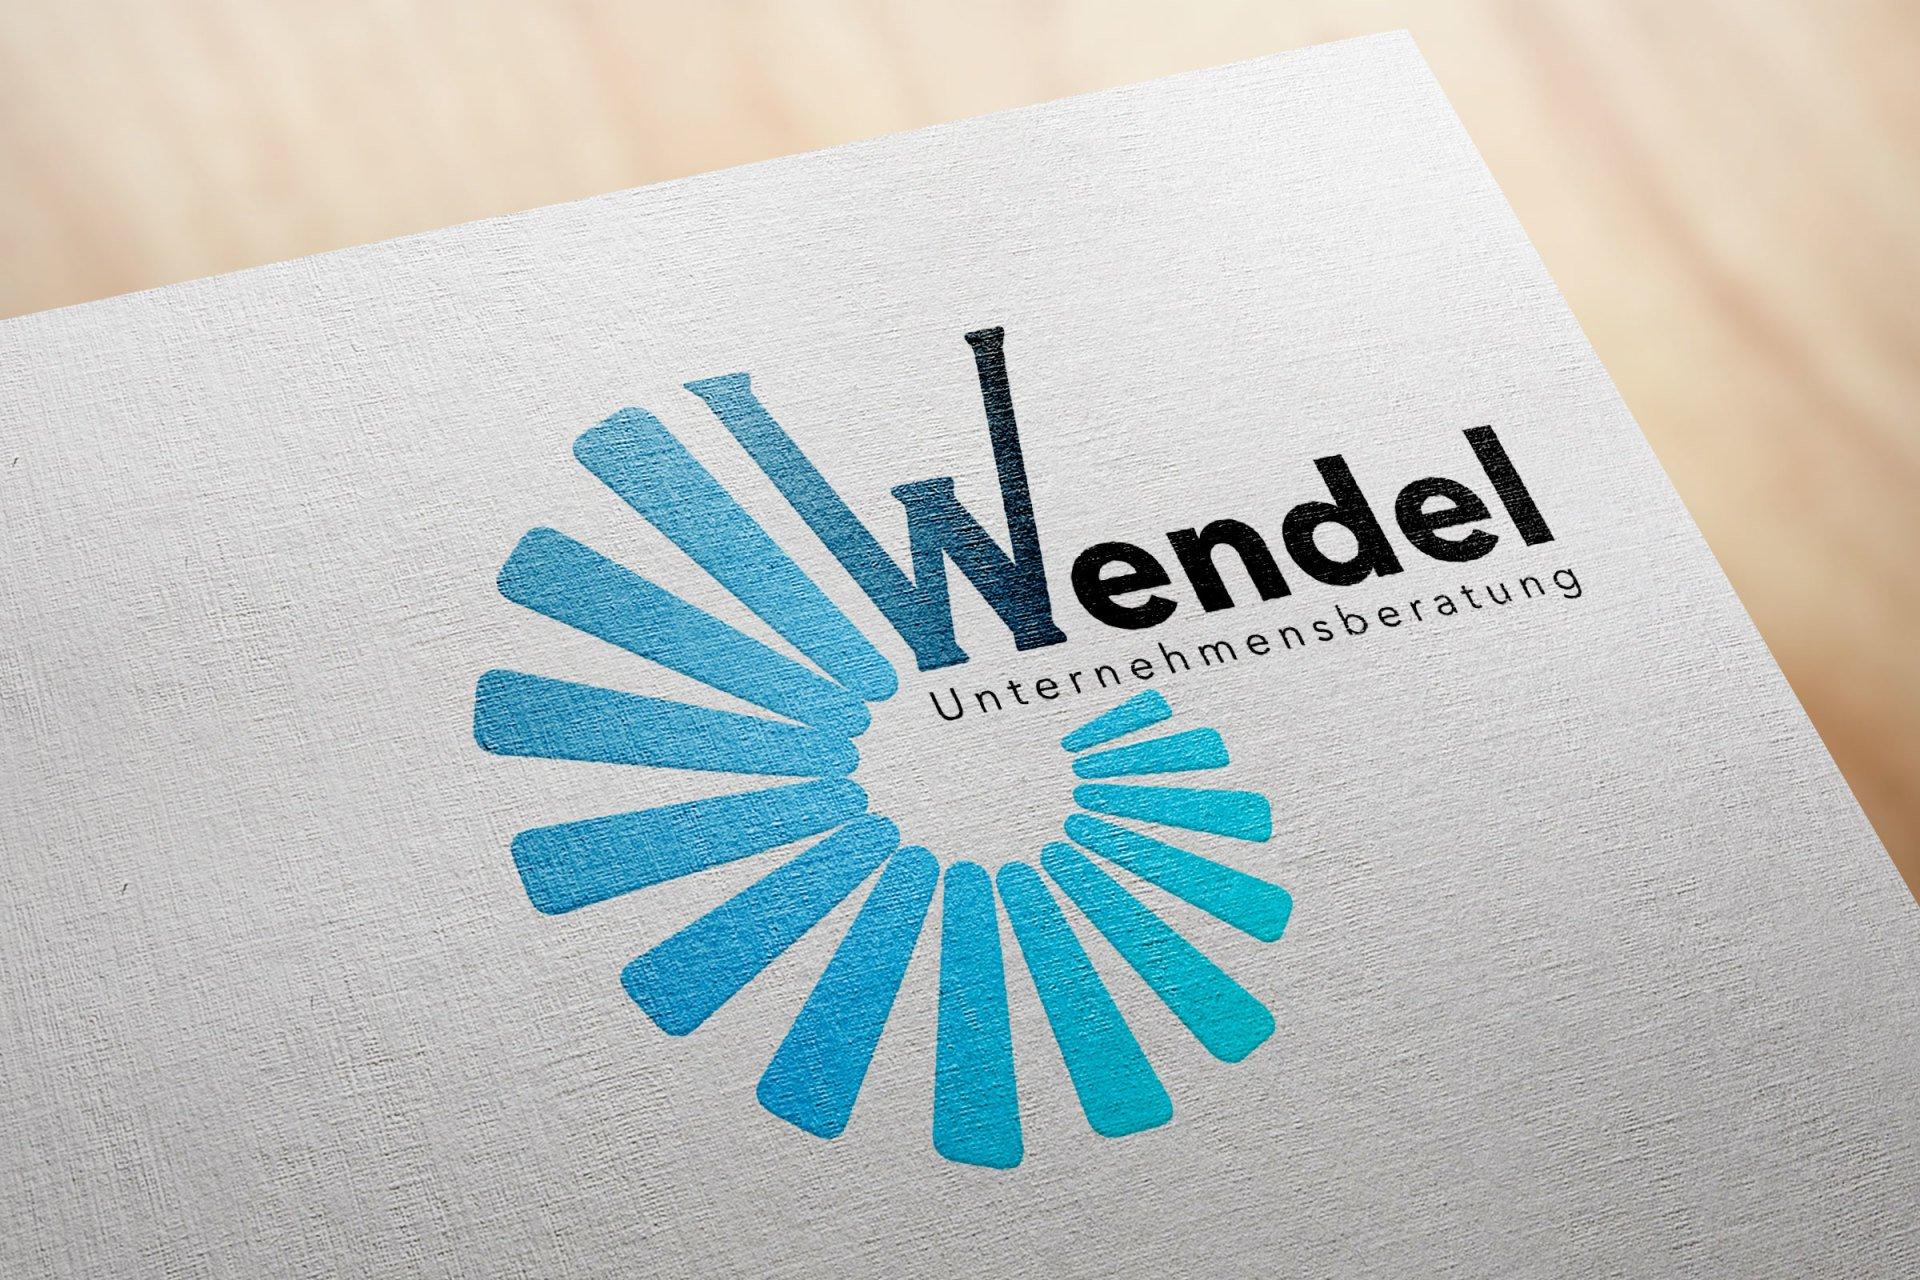 Ronald Wendel Corona Krise Hilfe